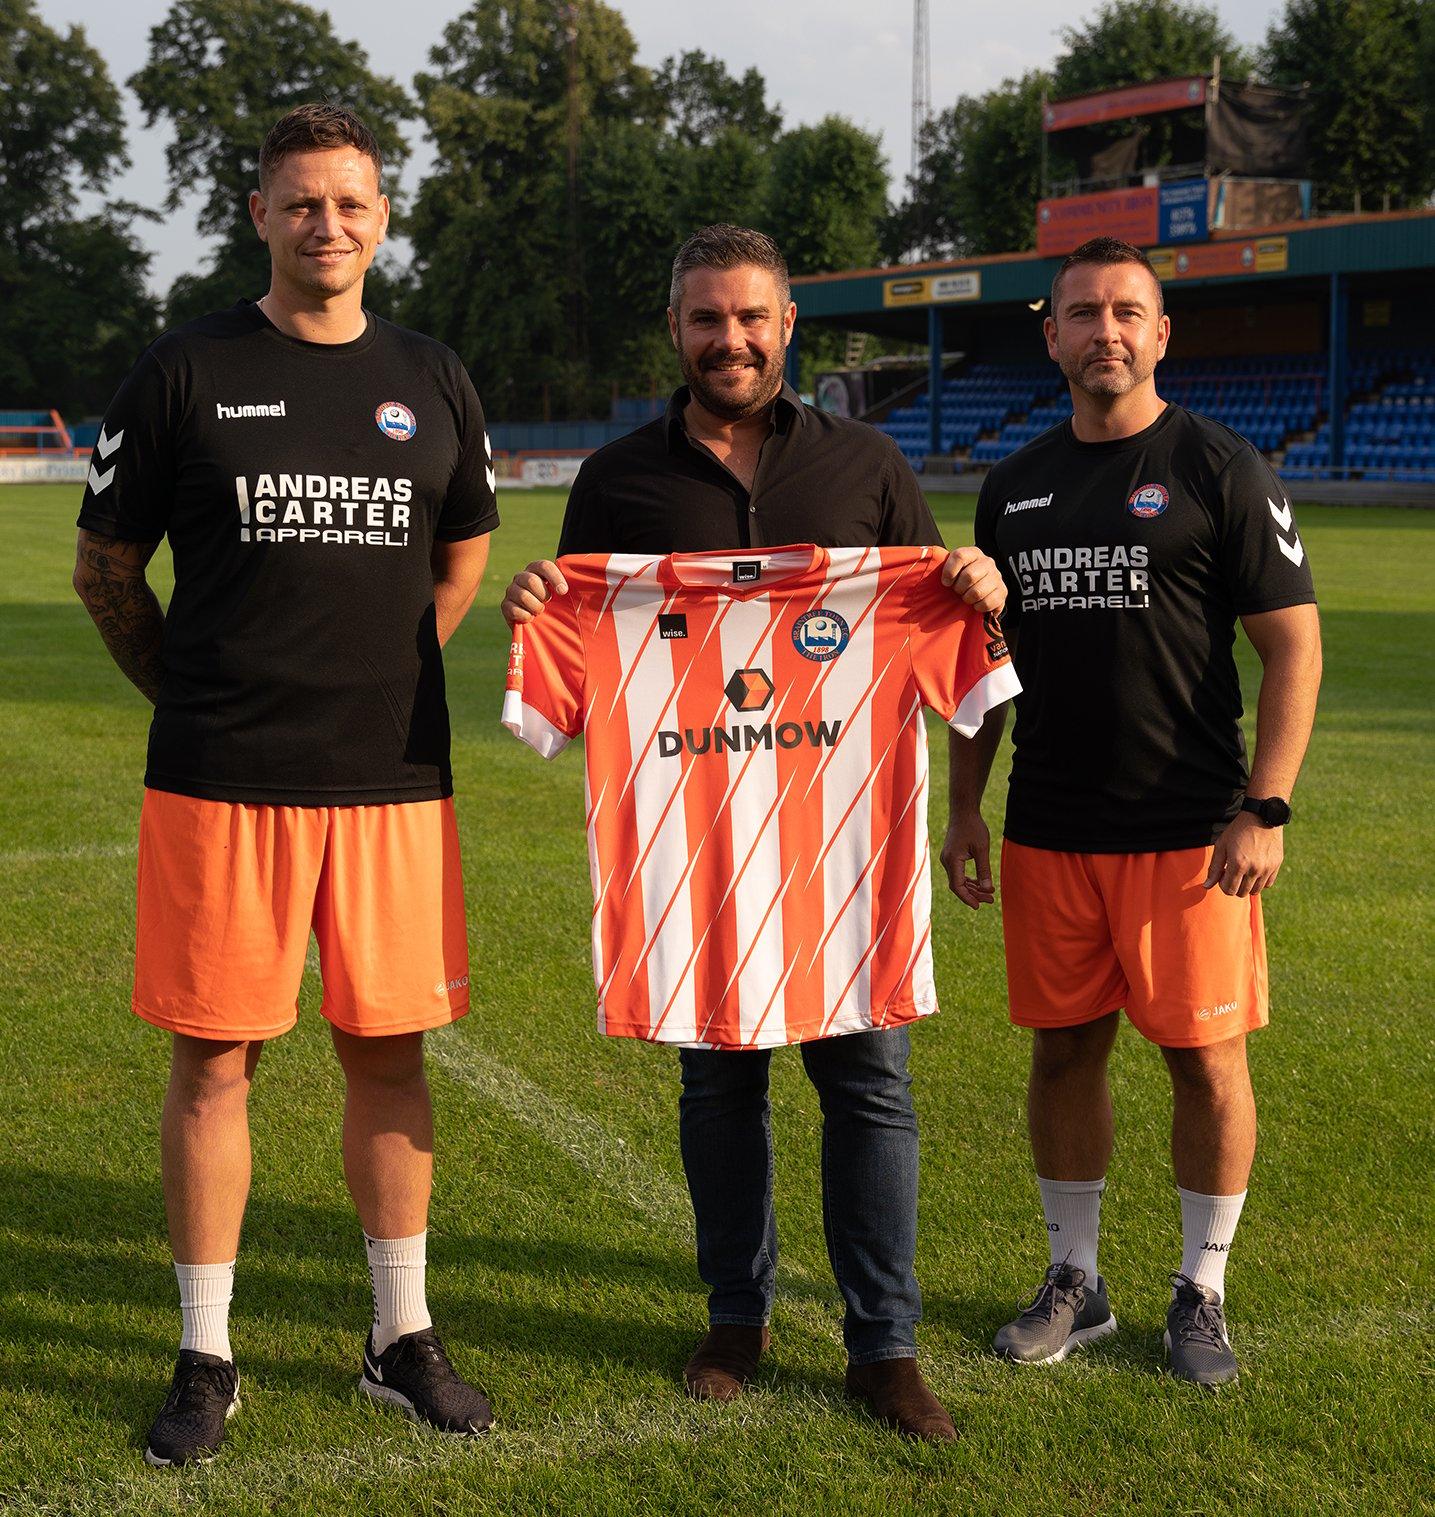 Dunmow-Group-Sponsors-Braintree-Town-FC